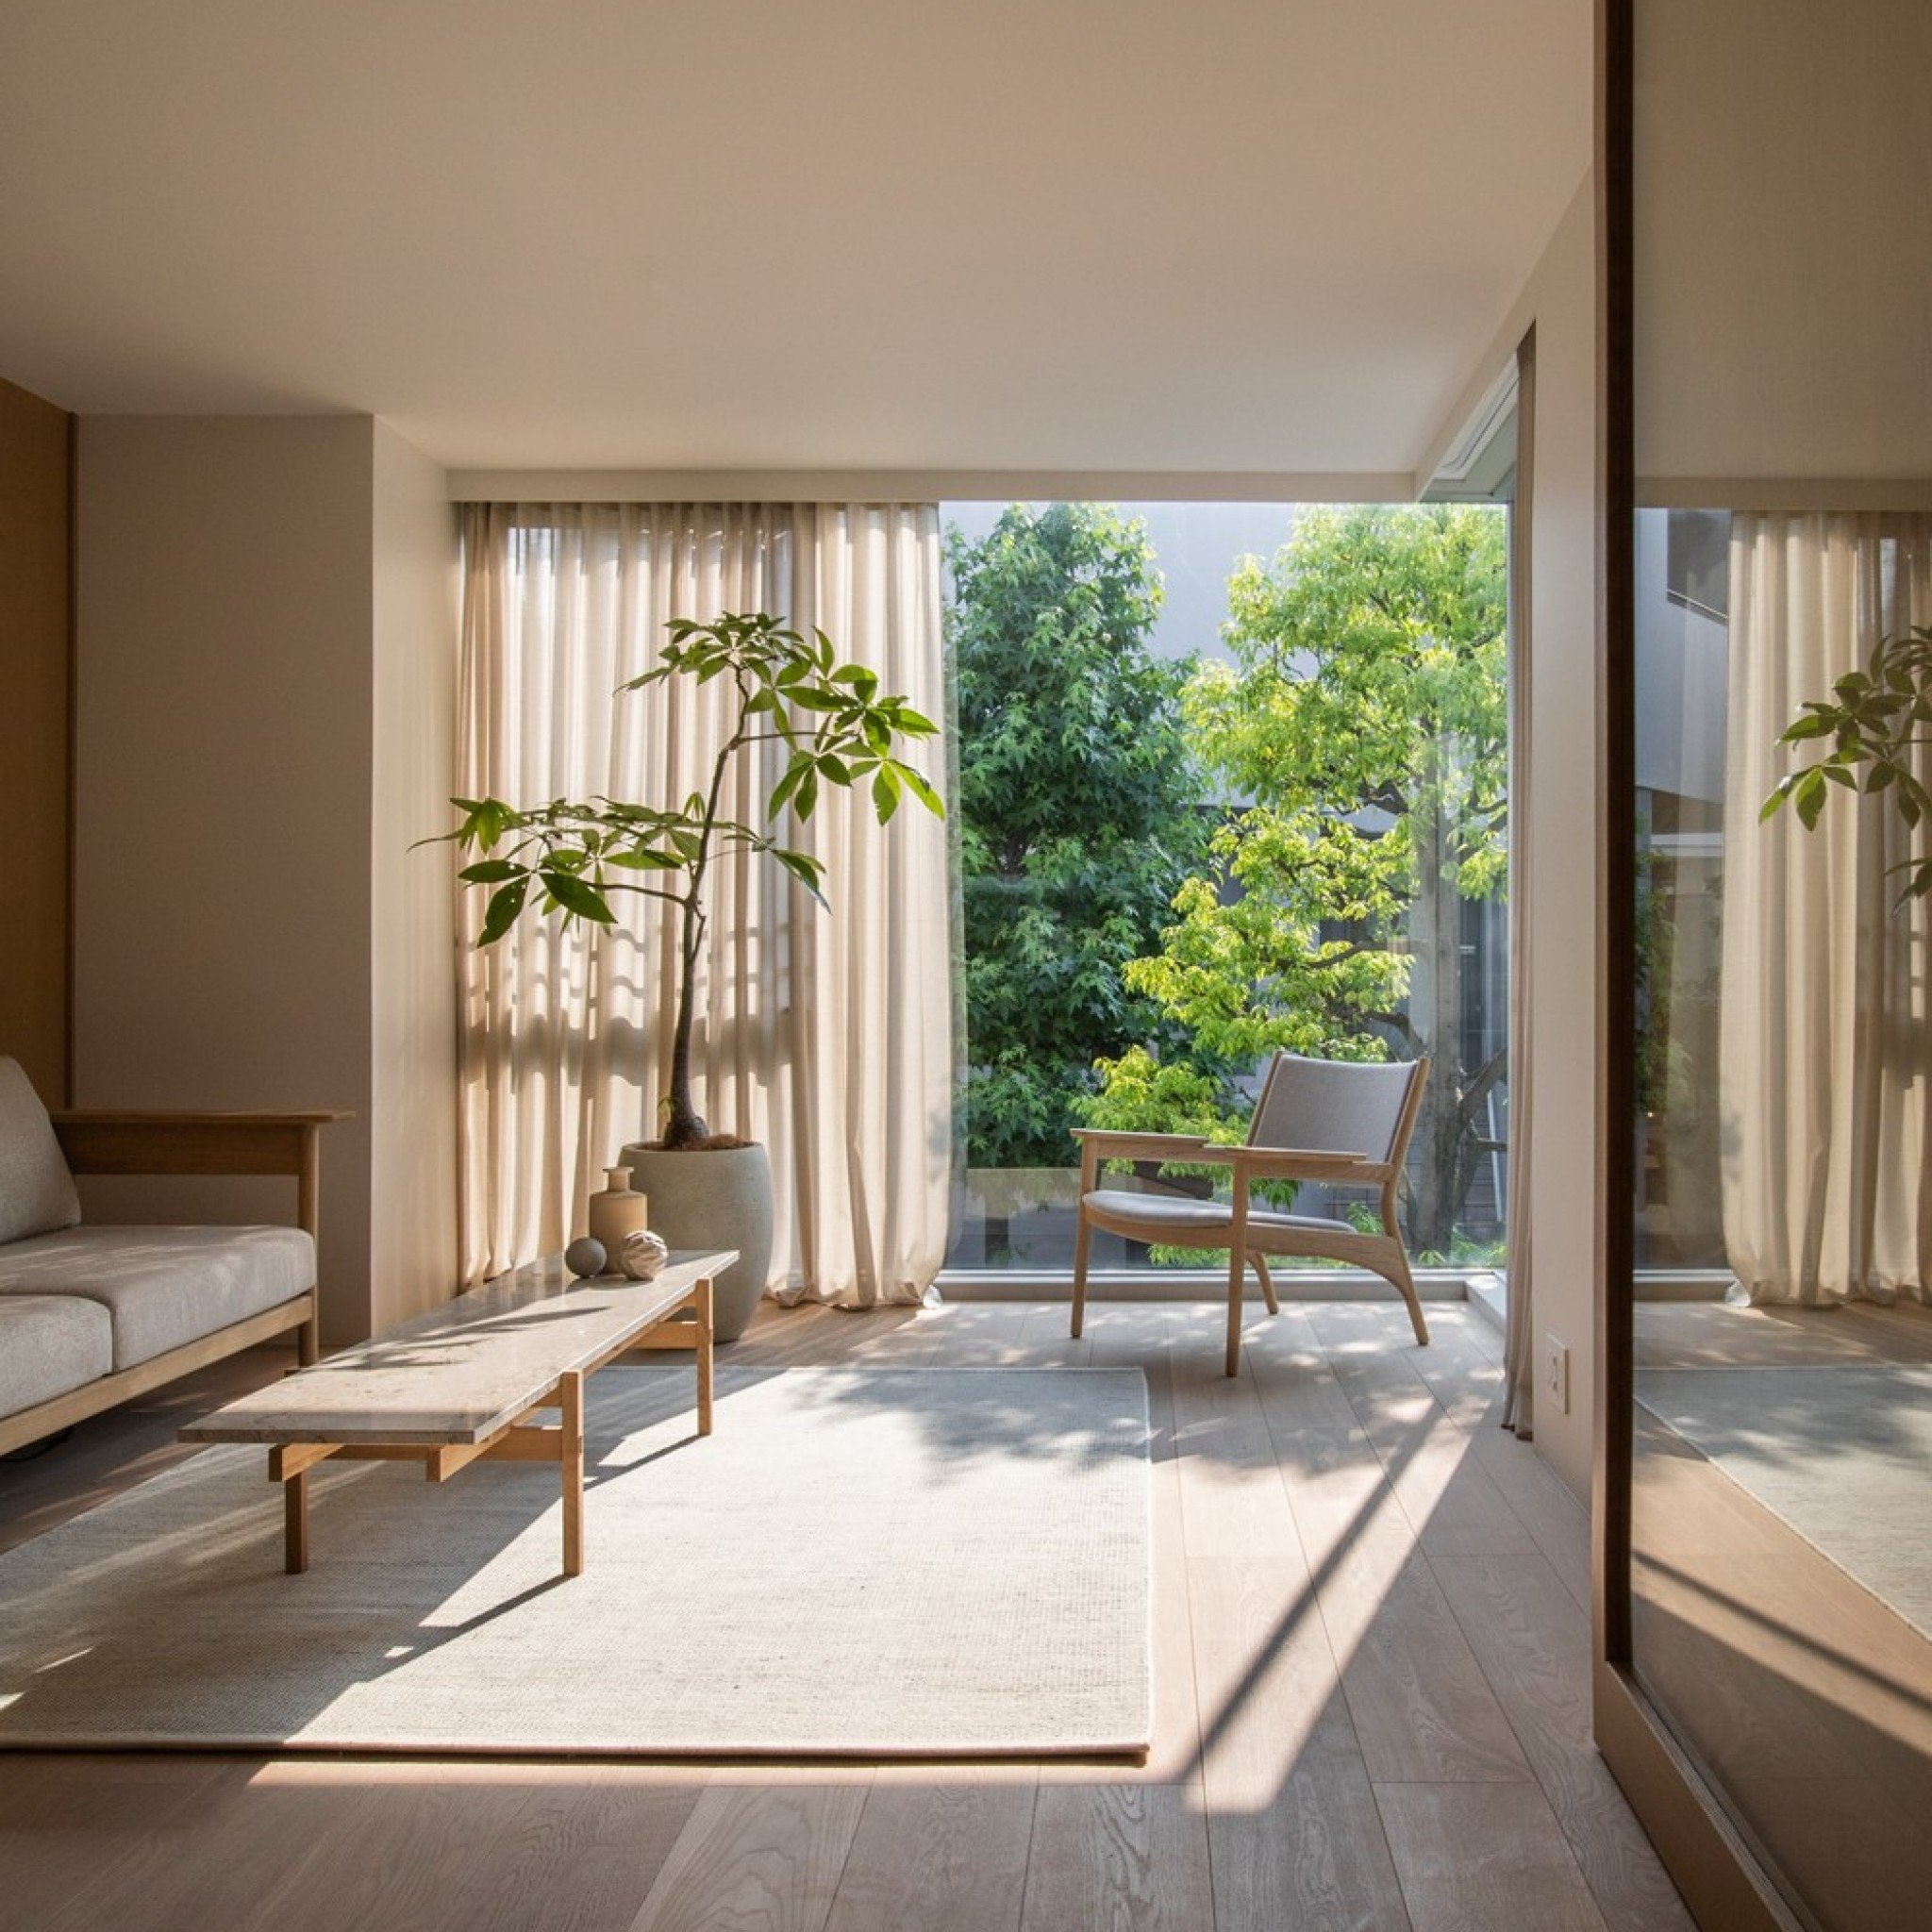 Ten elegant living rooms with Japandi interiors